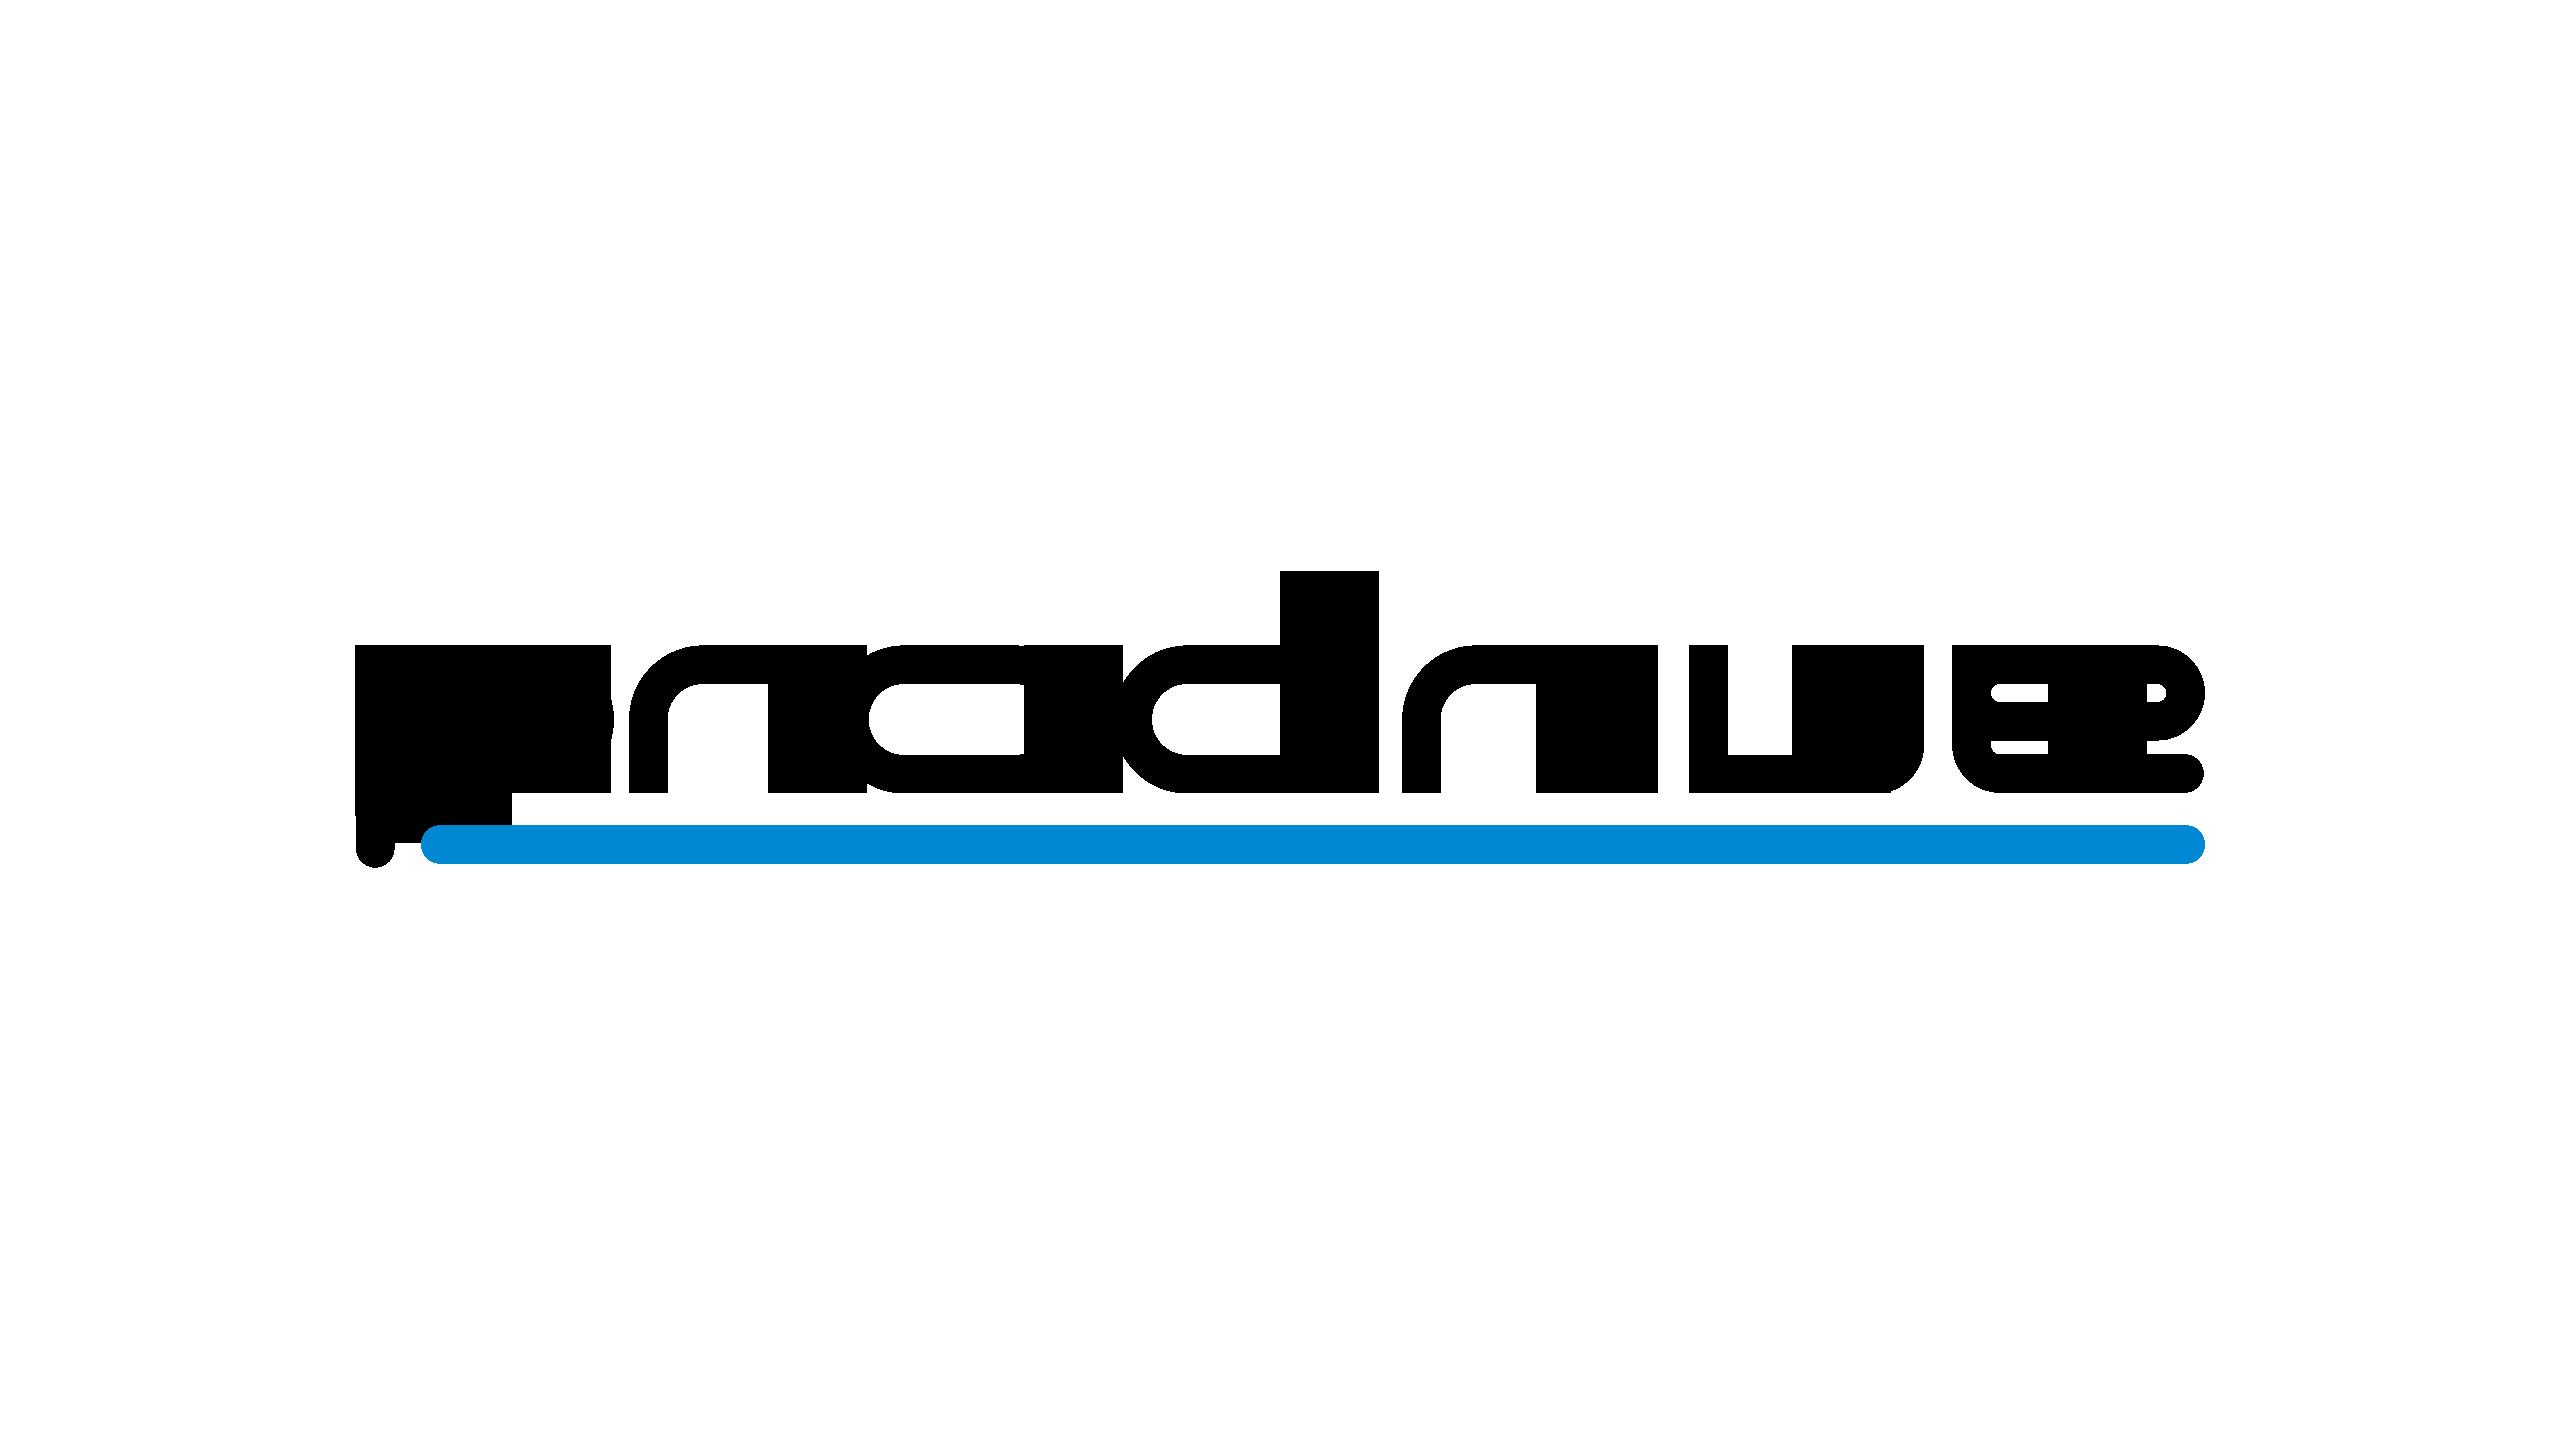 Prodrive-logo-2560x1440